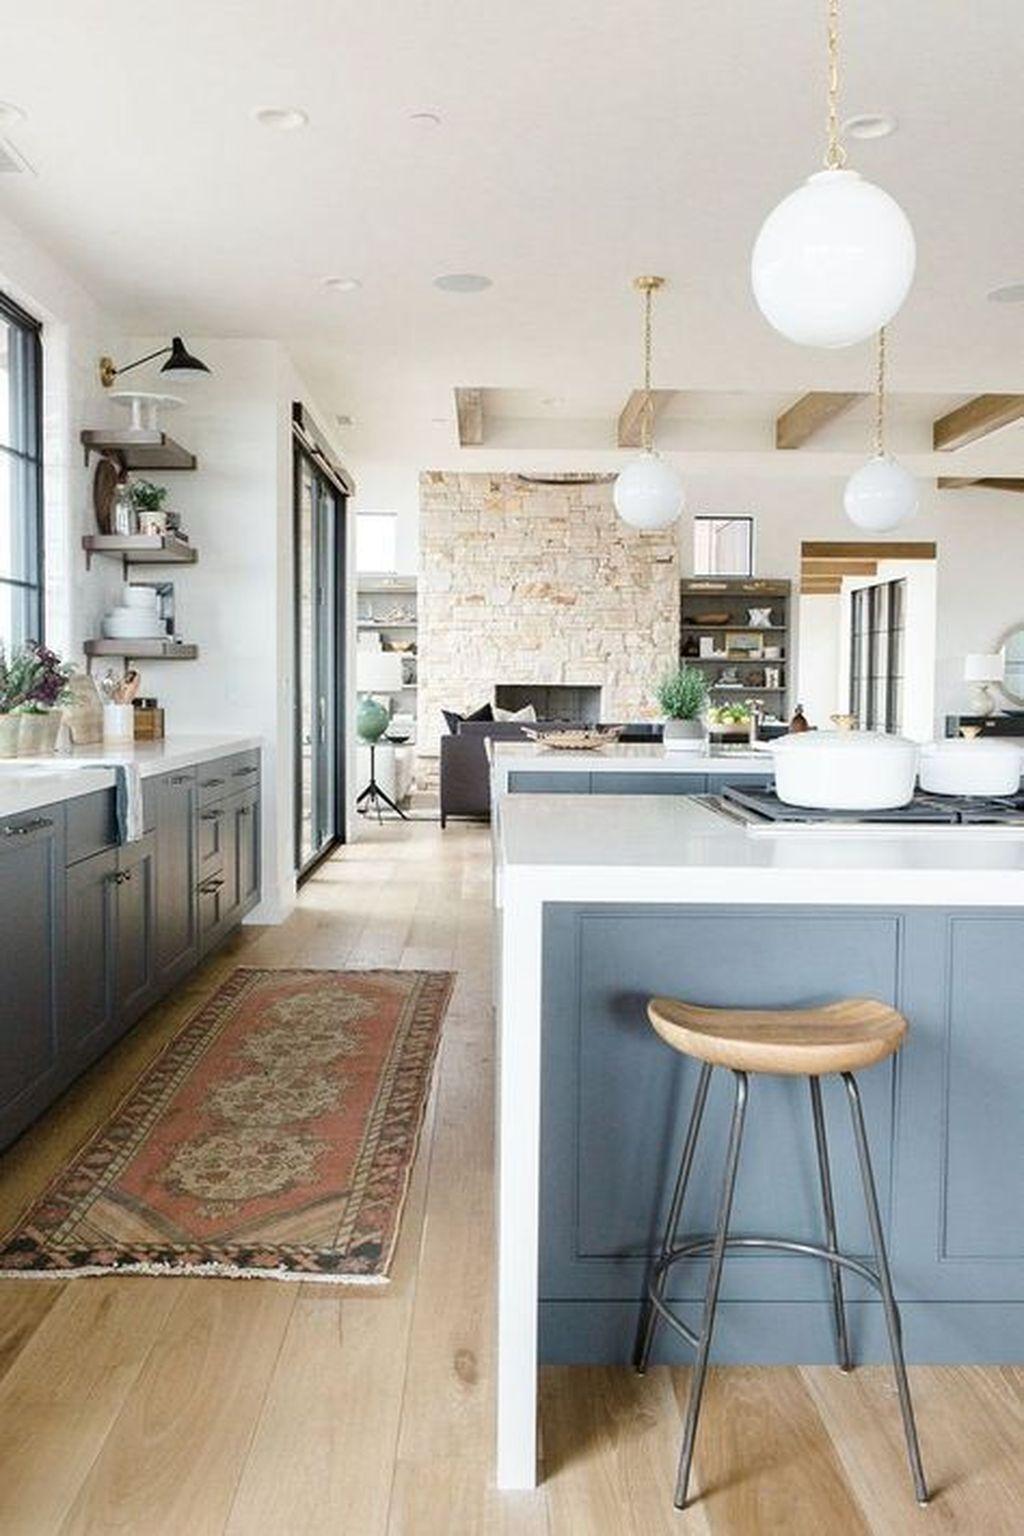 Cool 20+ Brilliant Open Kitchen Design Ideas. More At Https://trendhmdcr